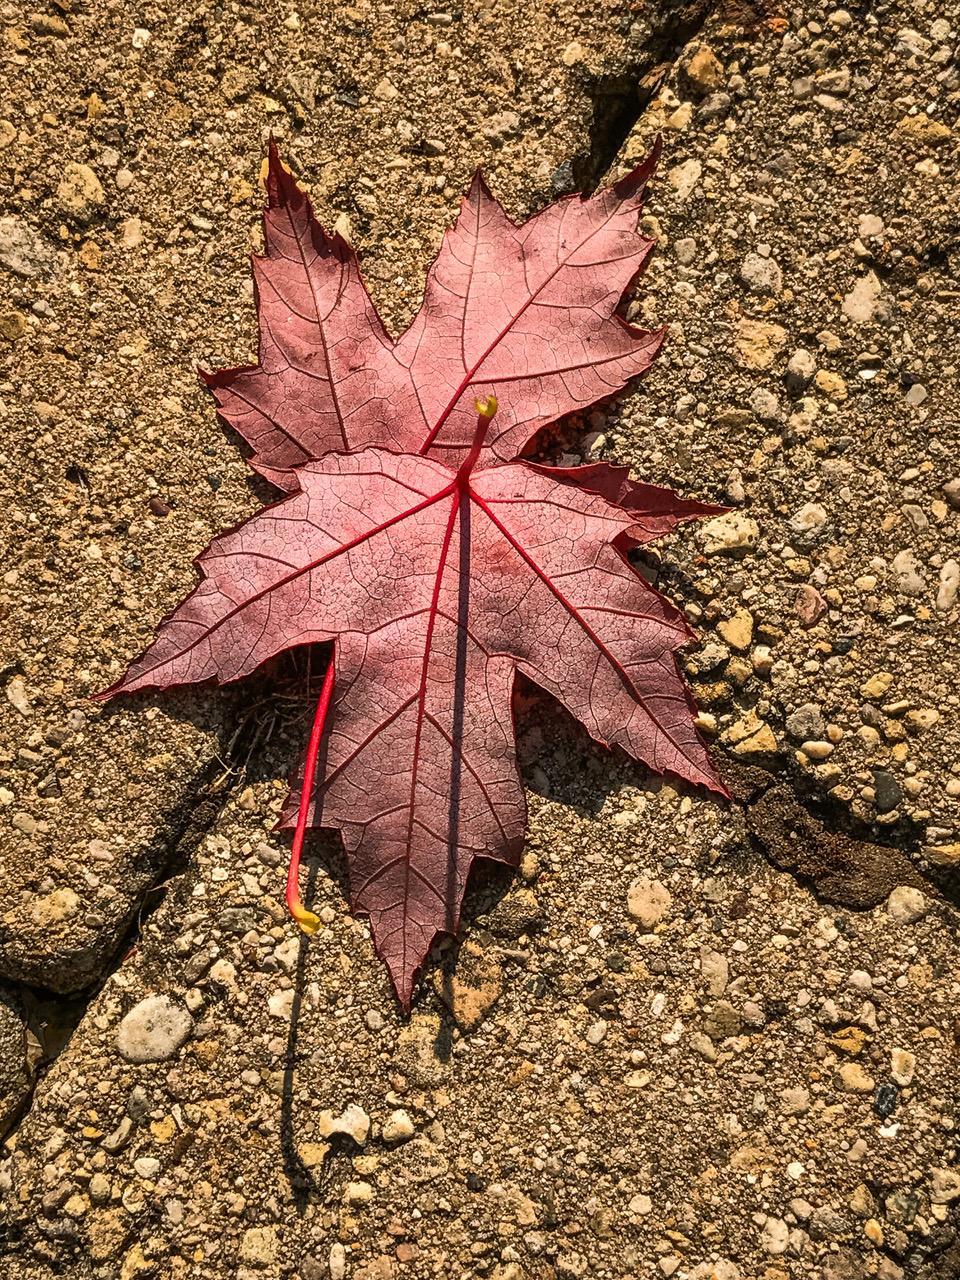 1st place - Fallen Leaves on Flagstone - Jack Kleinman